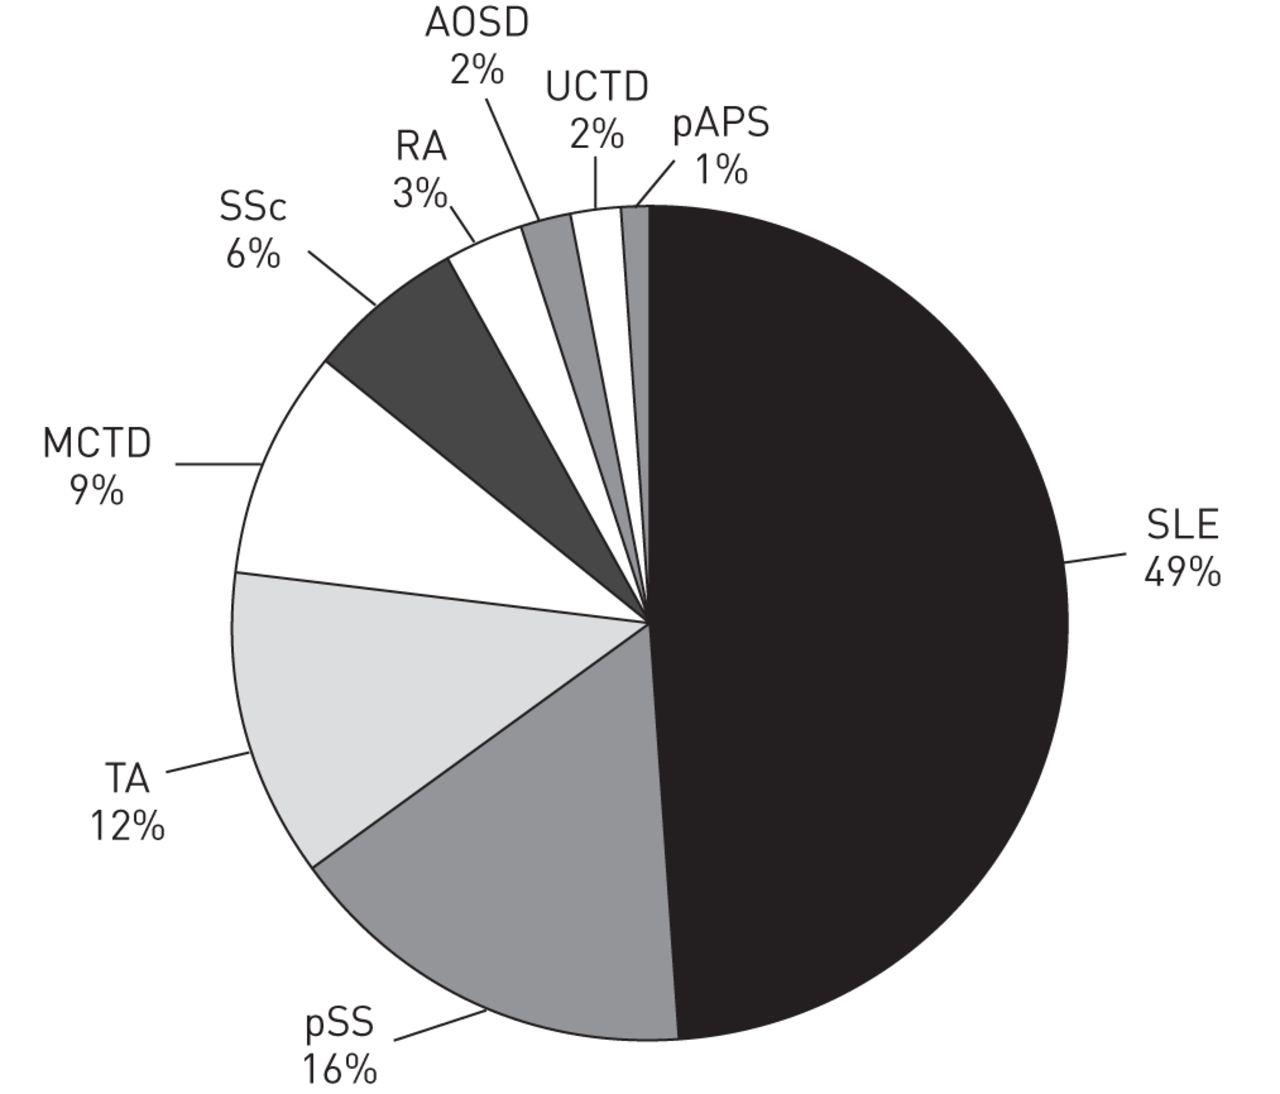 Connective tissue disease-associated pulmonary arterial